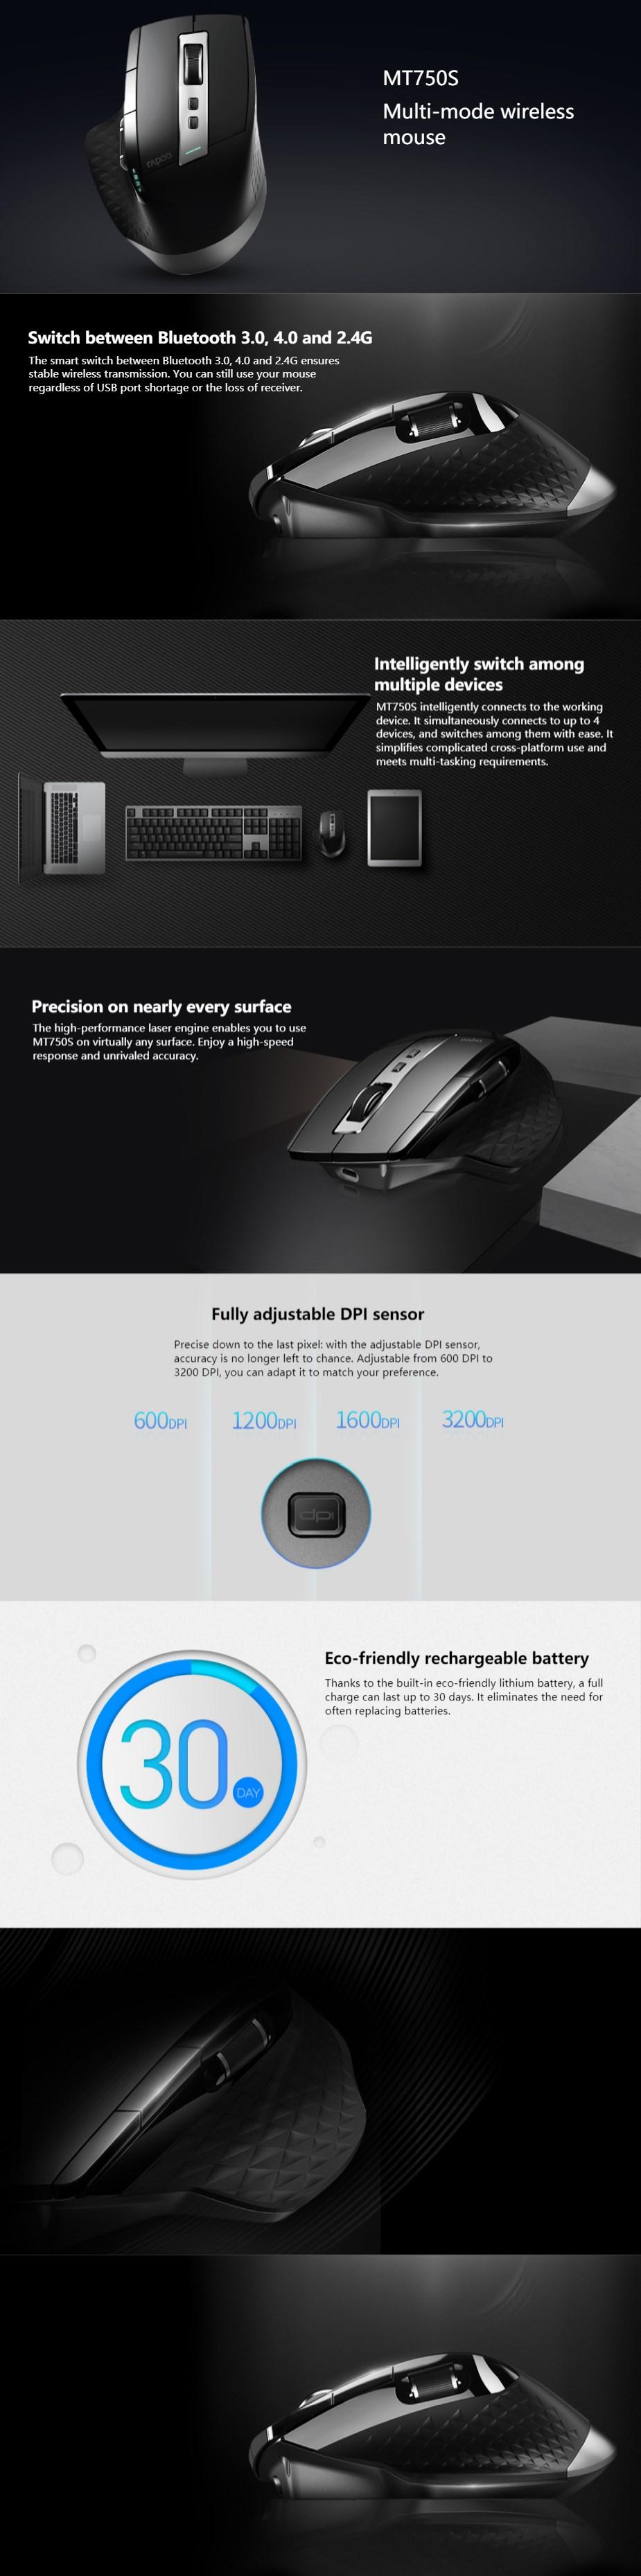 rapoo-mt750s-wireless-bluetooth-laser-mouse-ac26656.jpg